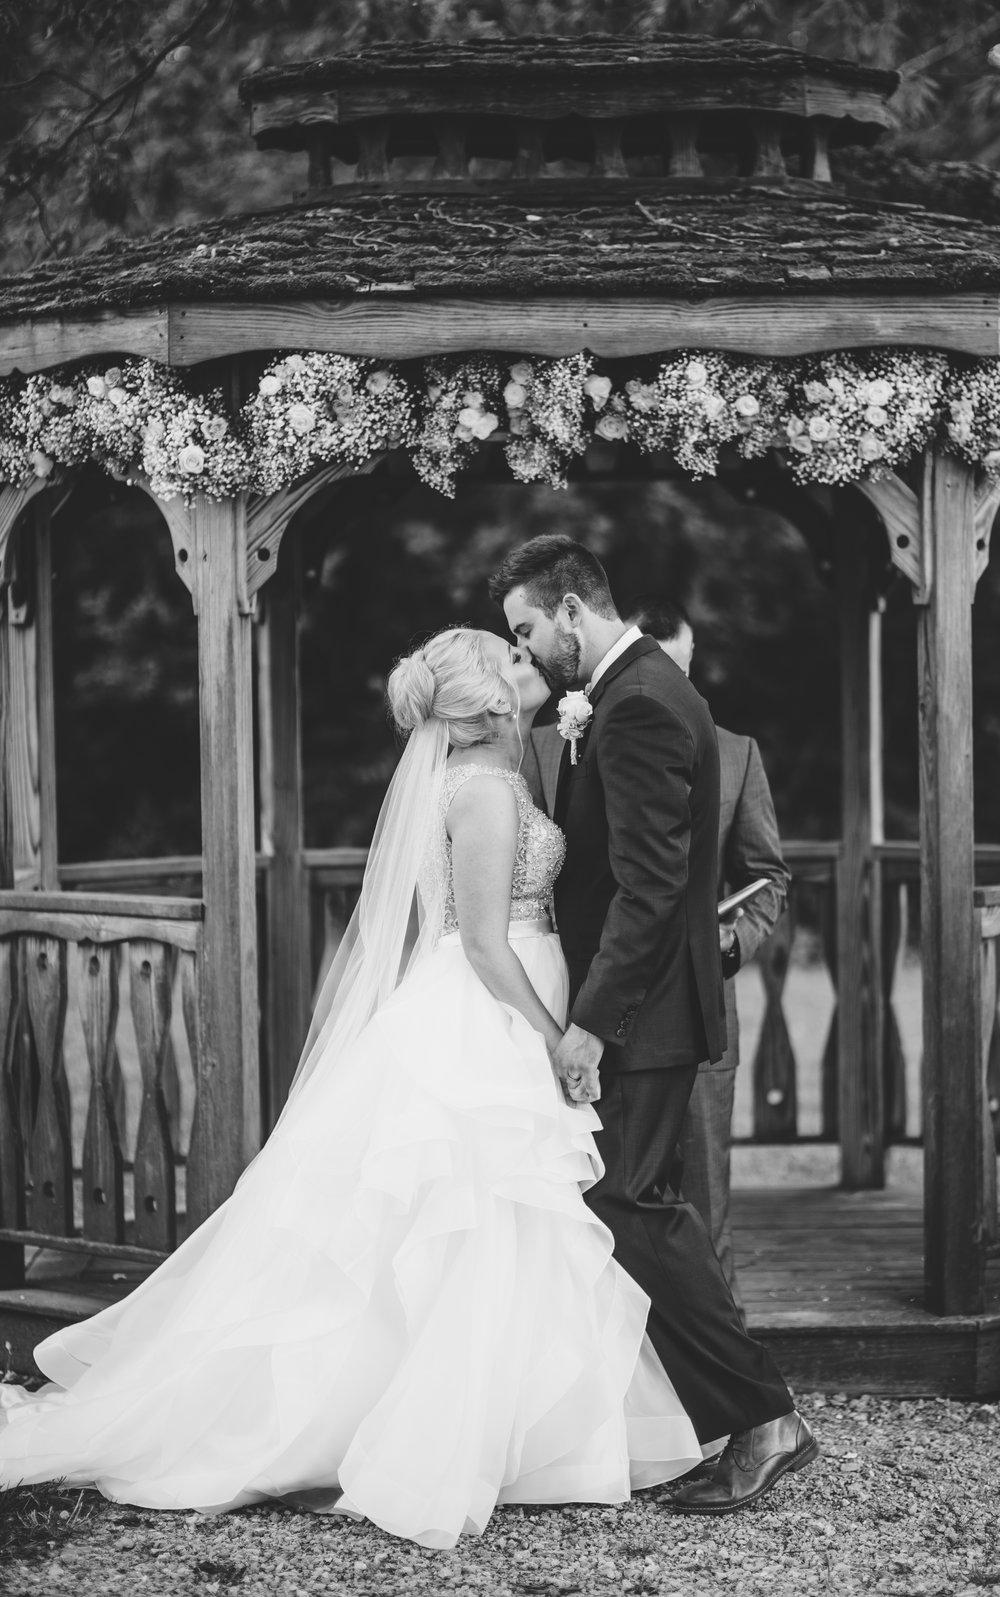 everleigh-photography-cincinnati-wedding-photographer-1913-heartland-barn-northern-kentucky-weddiing-photographer-amanda-and-chris-51